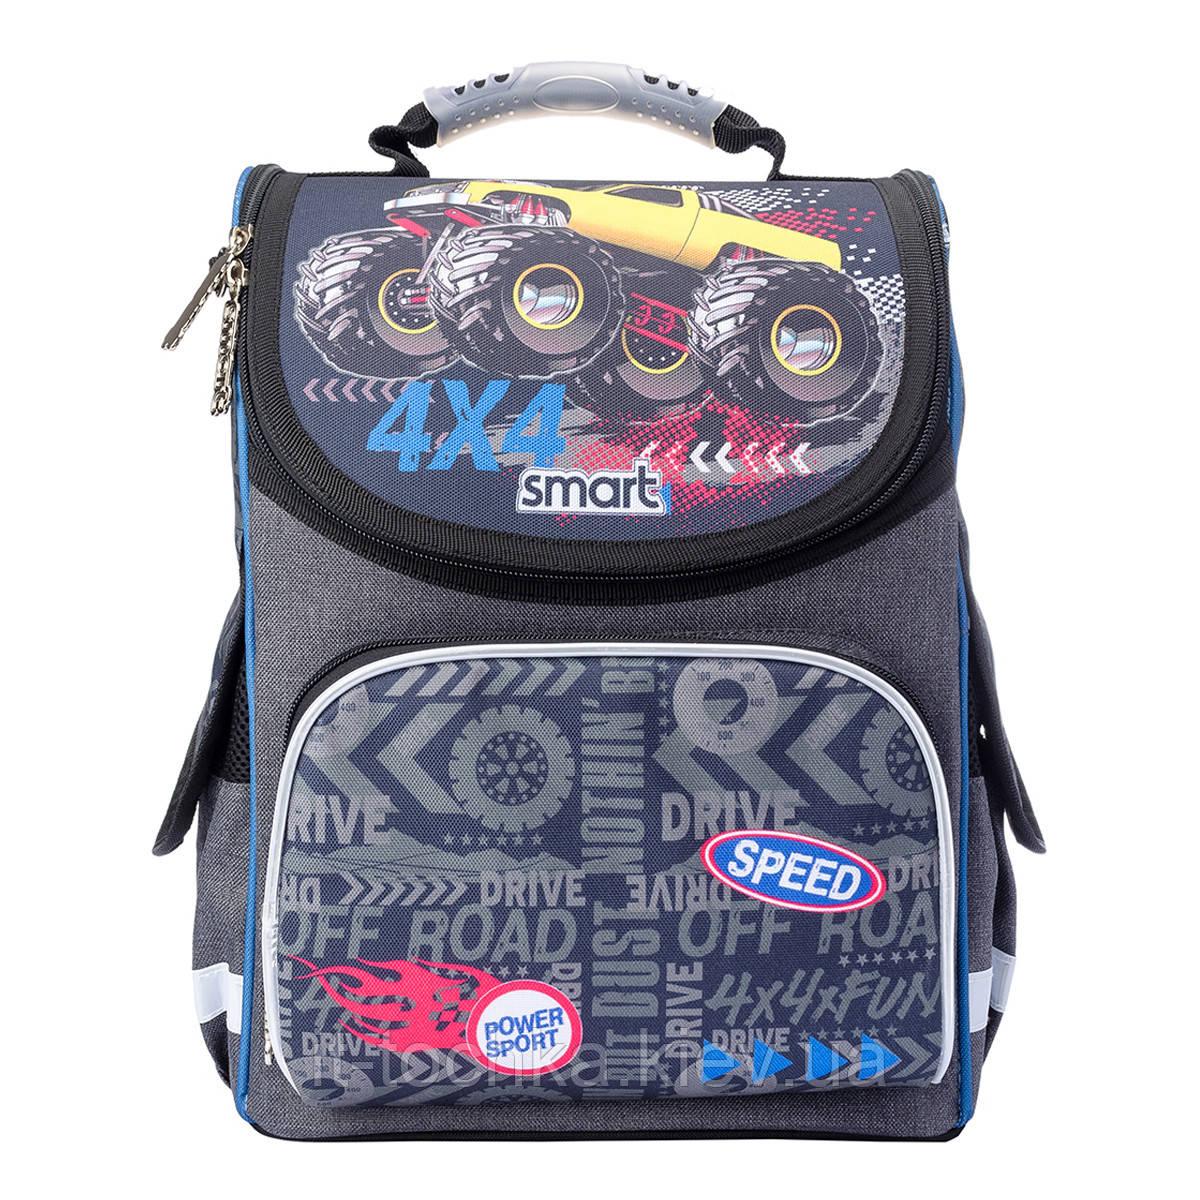 Рюкзак школьный, каркасный pg-11 speed 4*4 smart 557941